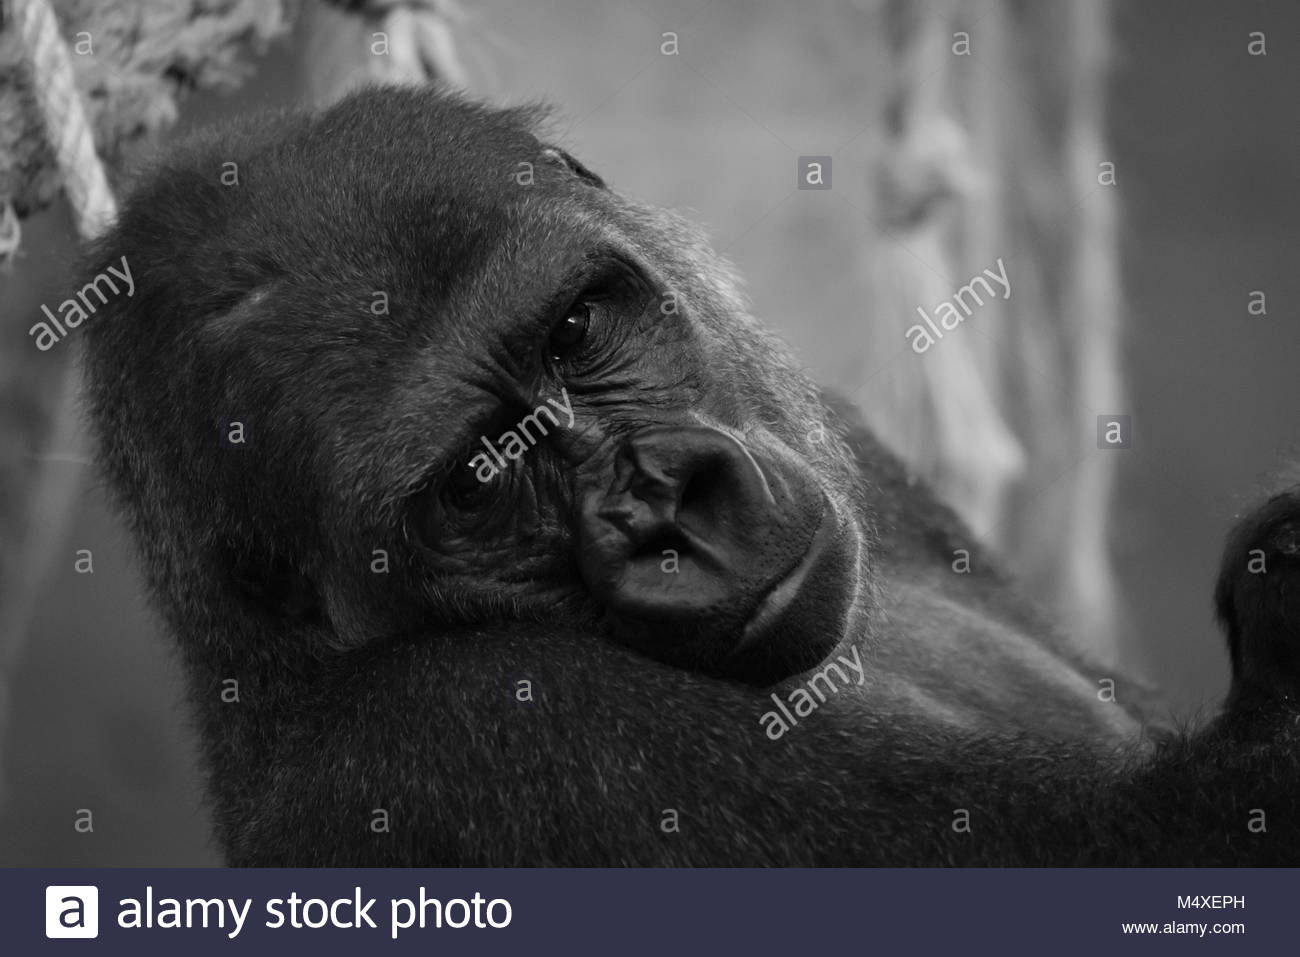 Mono close-up of gorilla head in hammock - Stock Image